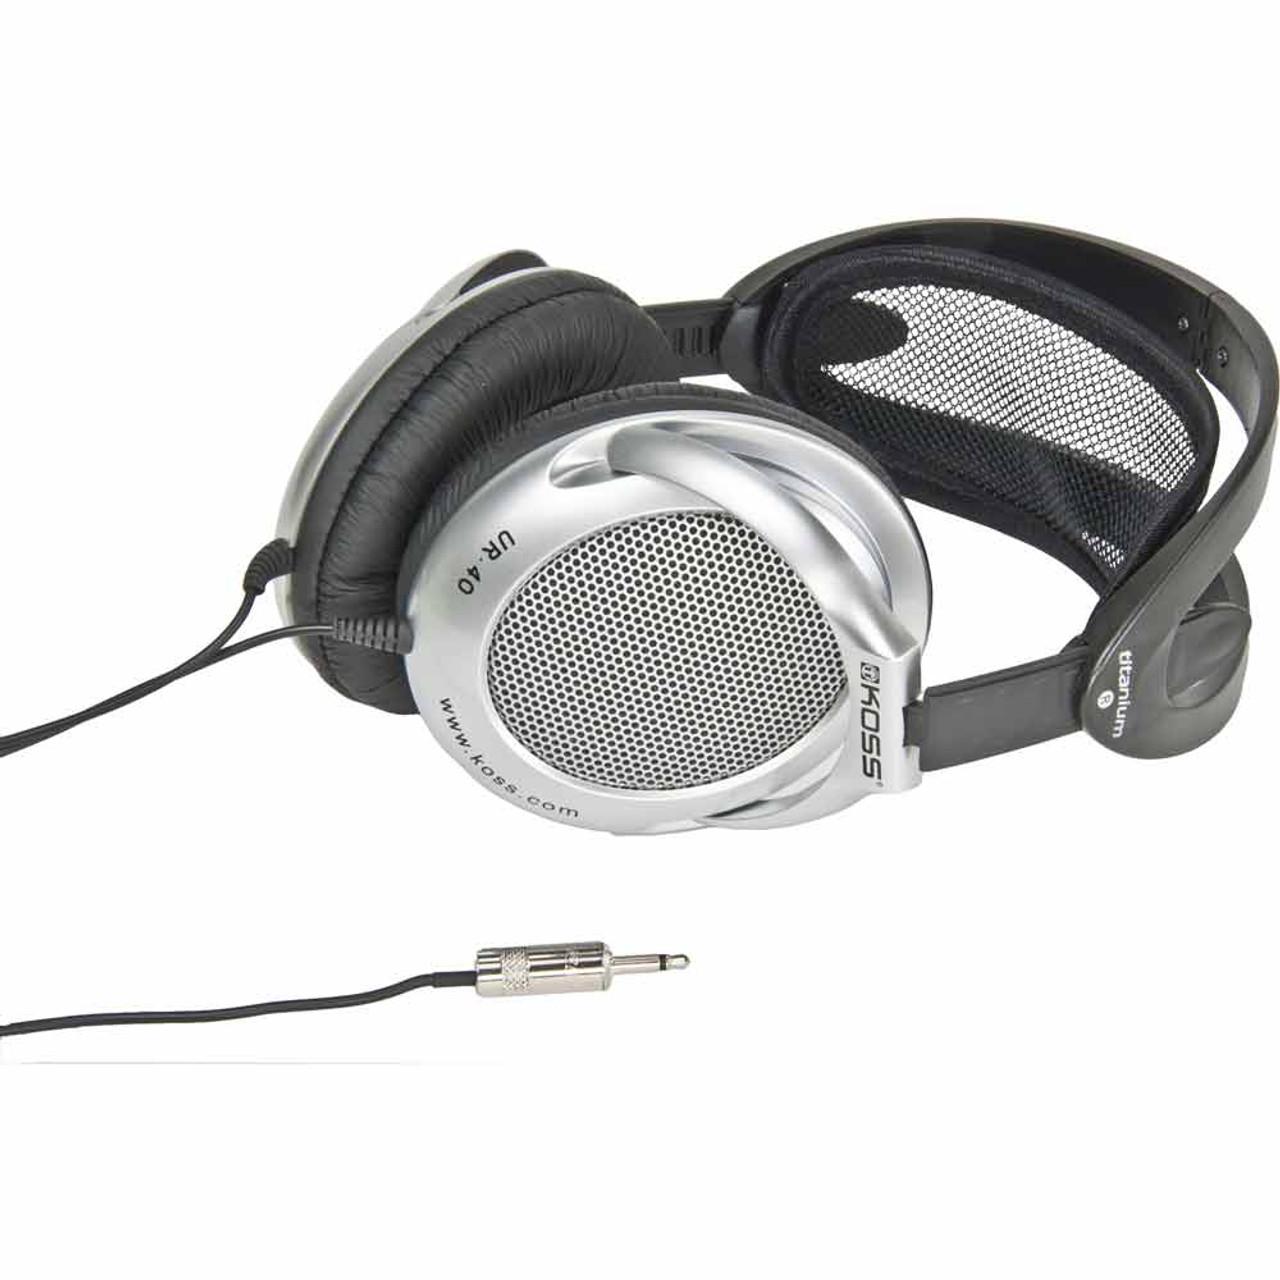 Cardionics 718-0408 E-Scope Large Headphones